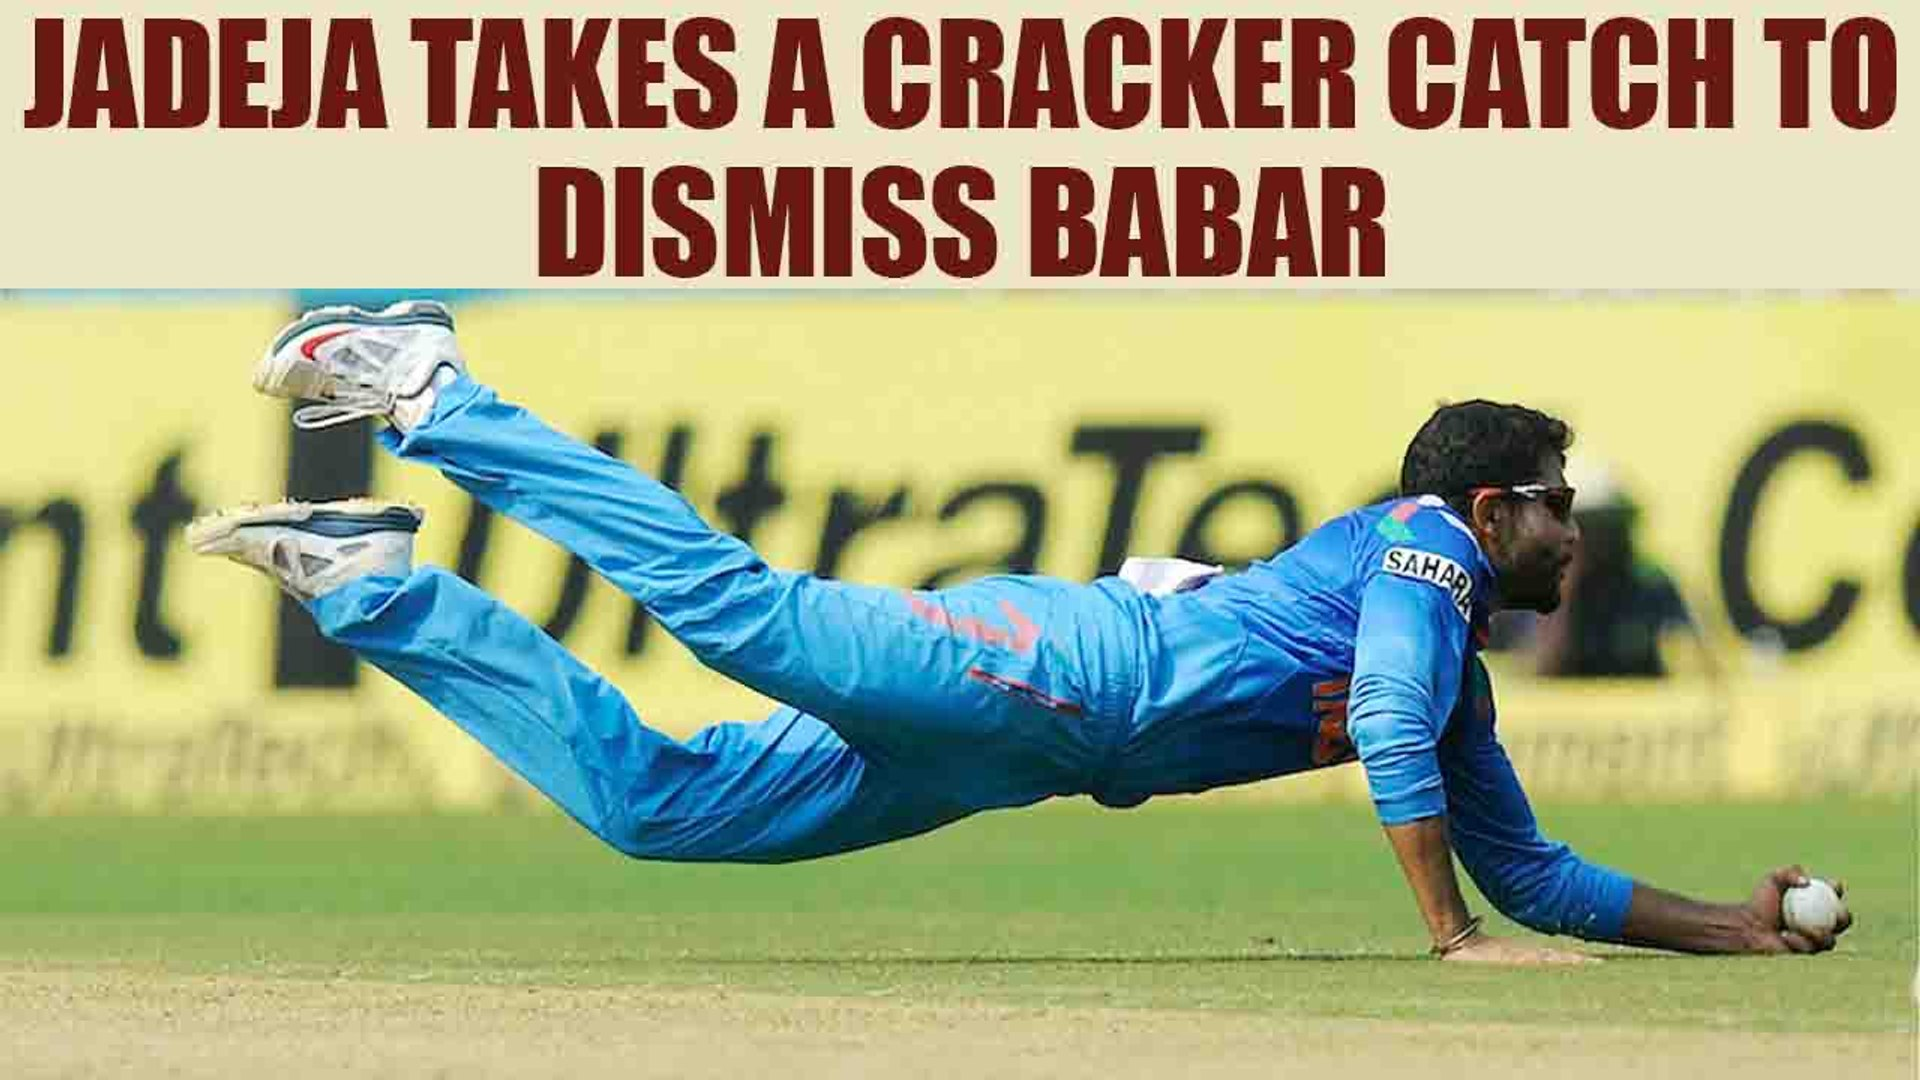 ICC Champions Trophy : Ravinder jadeja's brilliant catch to get Babar Azam's Wicket | Onei